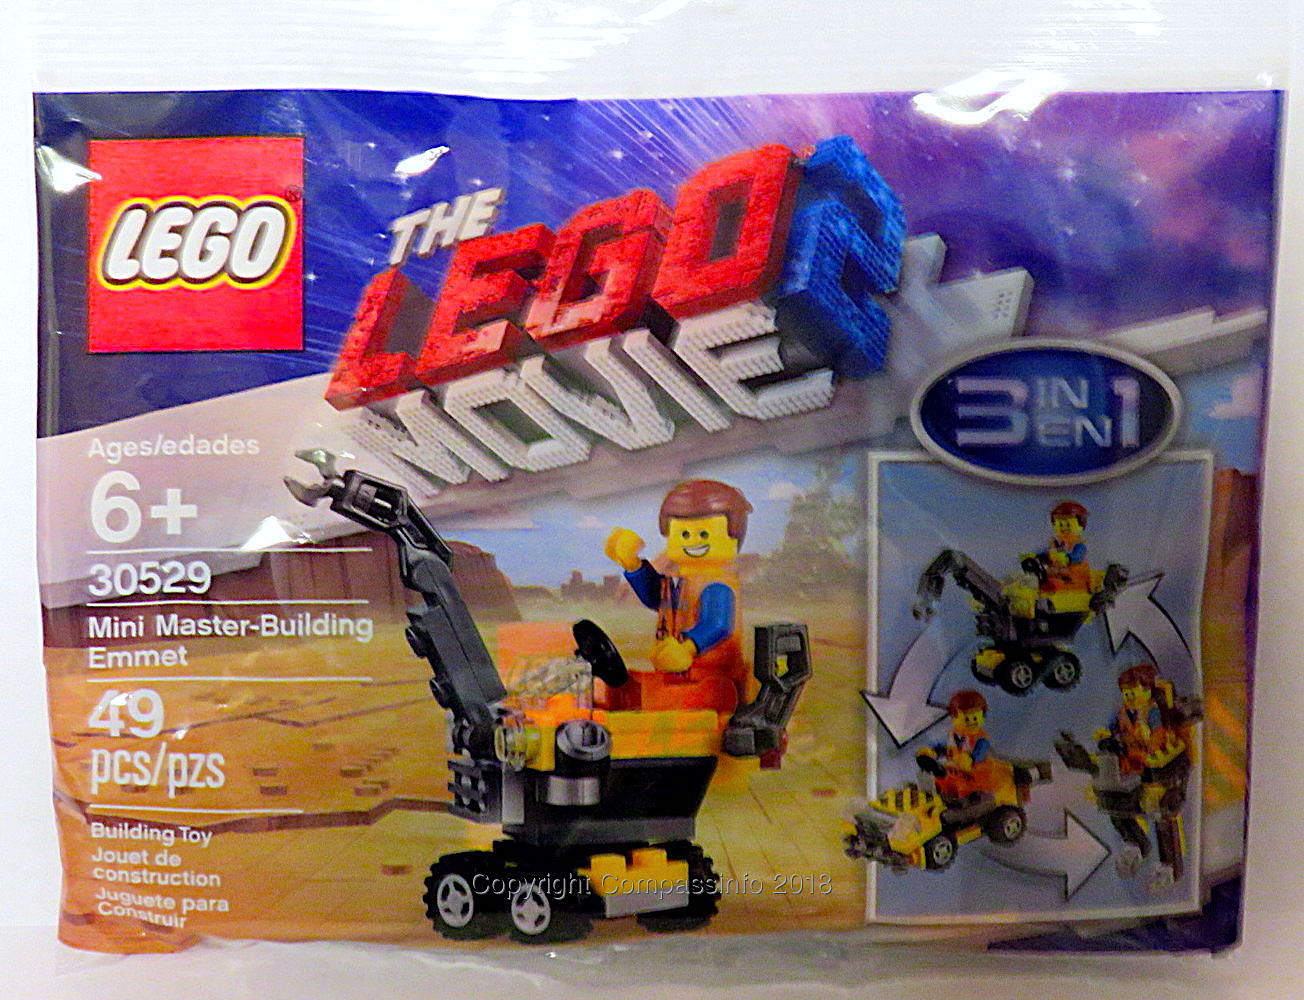 Lego 30529 Mini Master Building Emmet  Lego Movie 2 Polybag New and sealed...